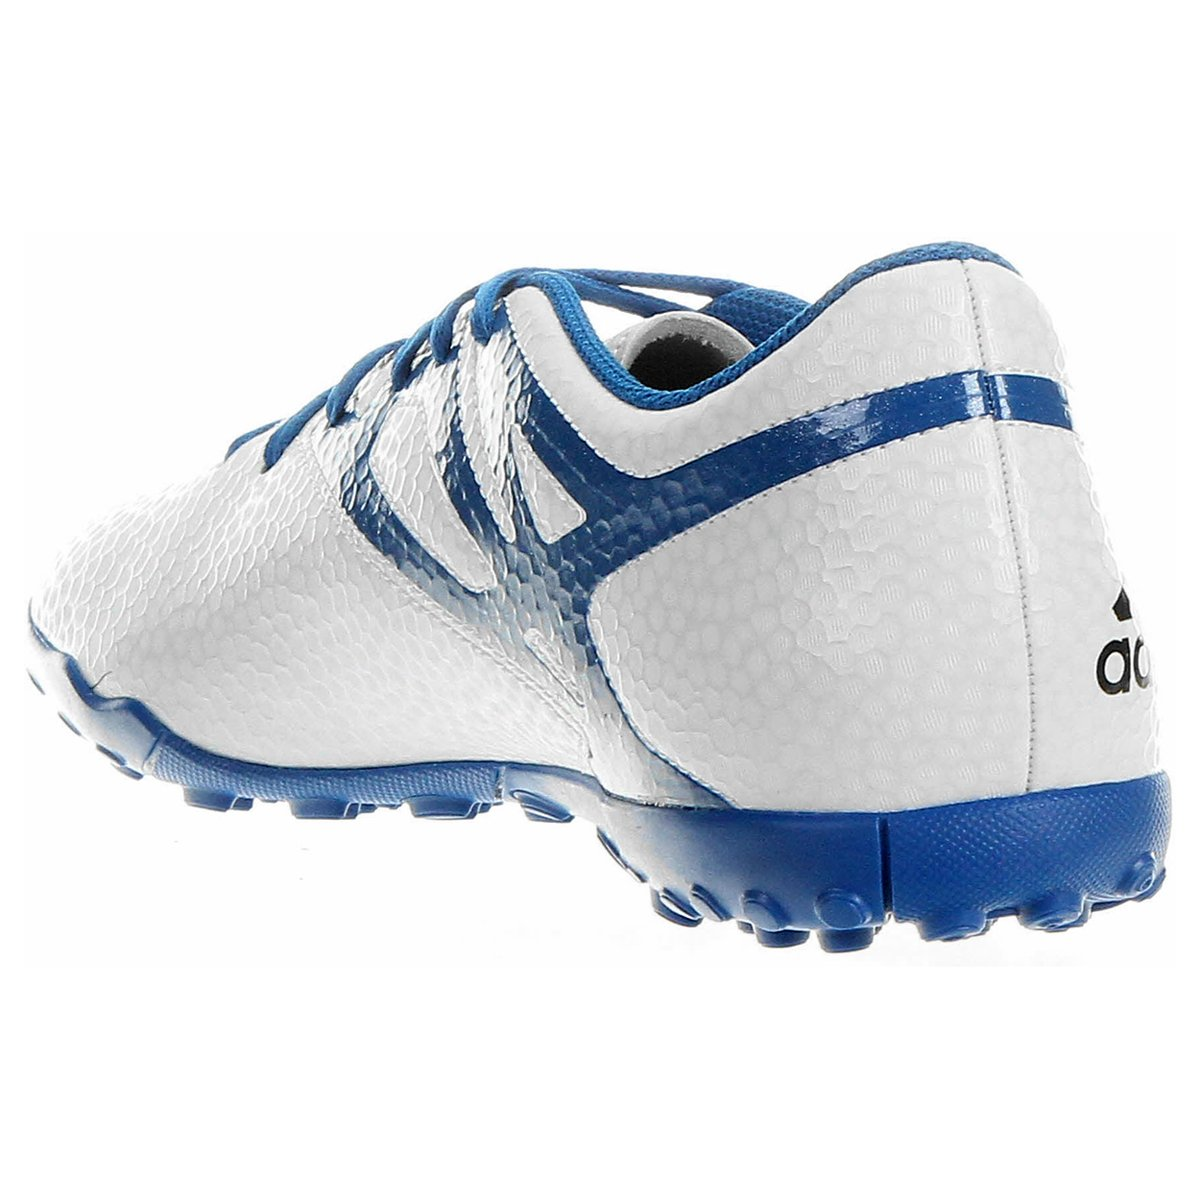 Chuteira Society Adidas Messi 15.4 TF Masculina - Compre Agora ... 6060481562d18